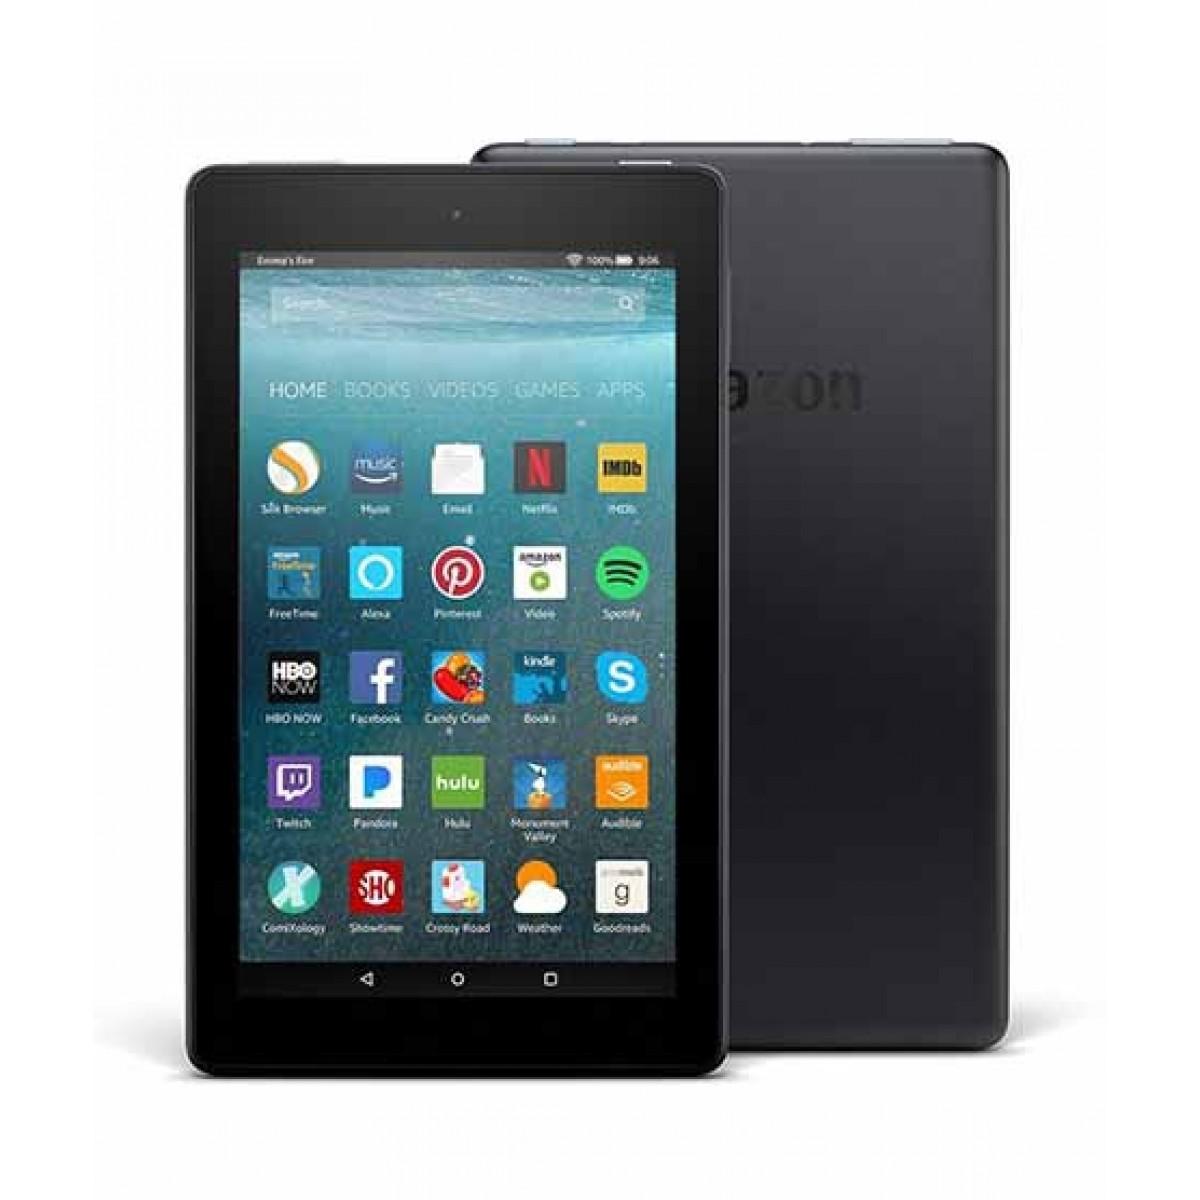 Amazon Fire 7 8GB WiFi Tablet Black